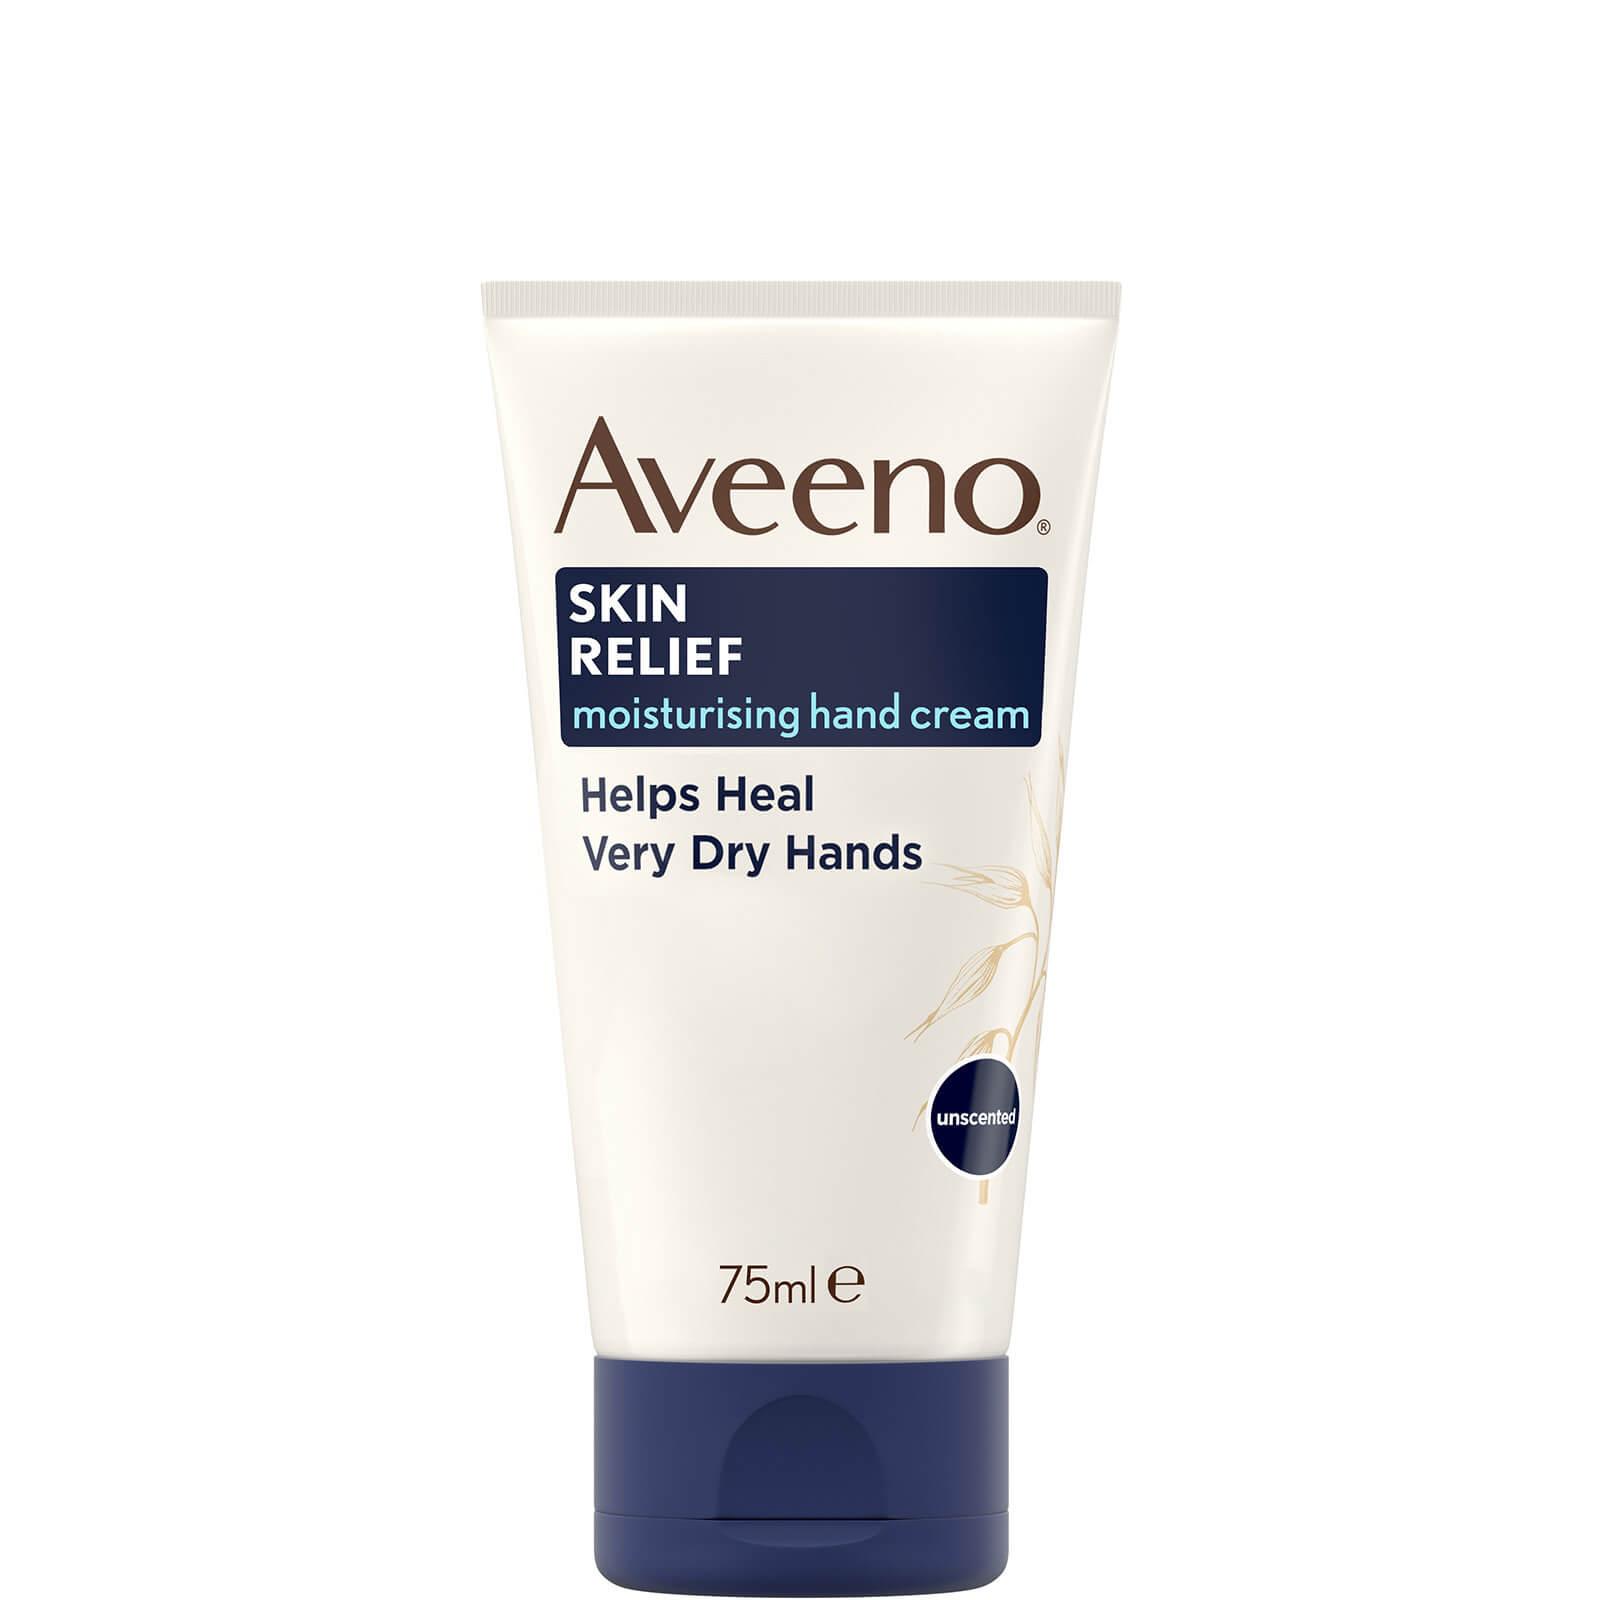 Купить Aveeno Skin Relief Moisturising Hand Cream 75ml